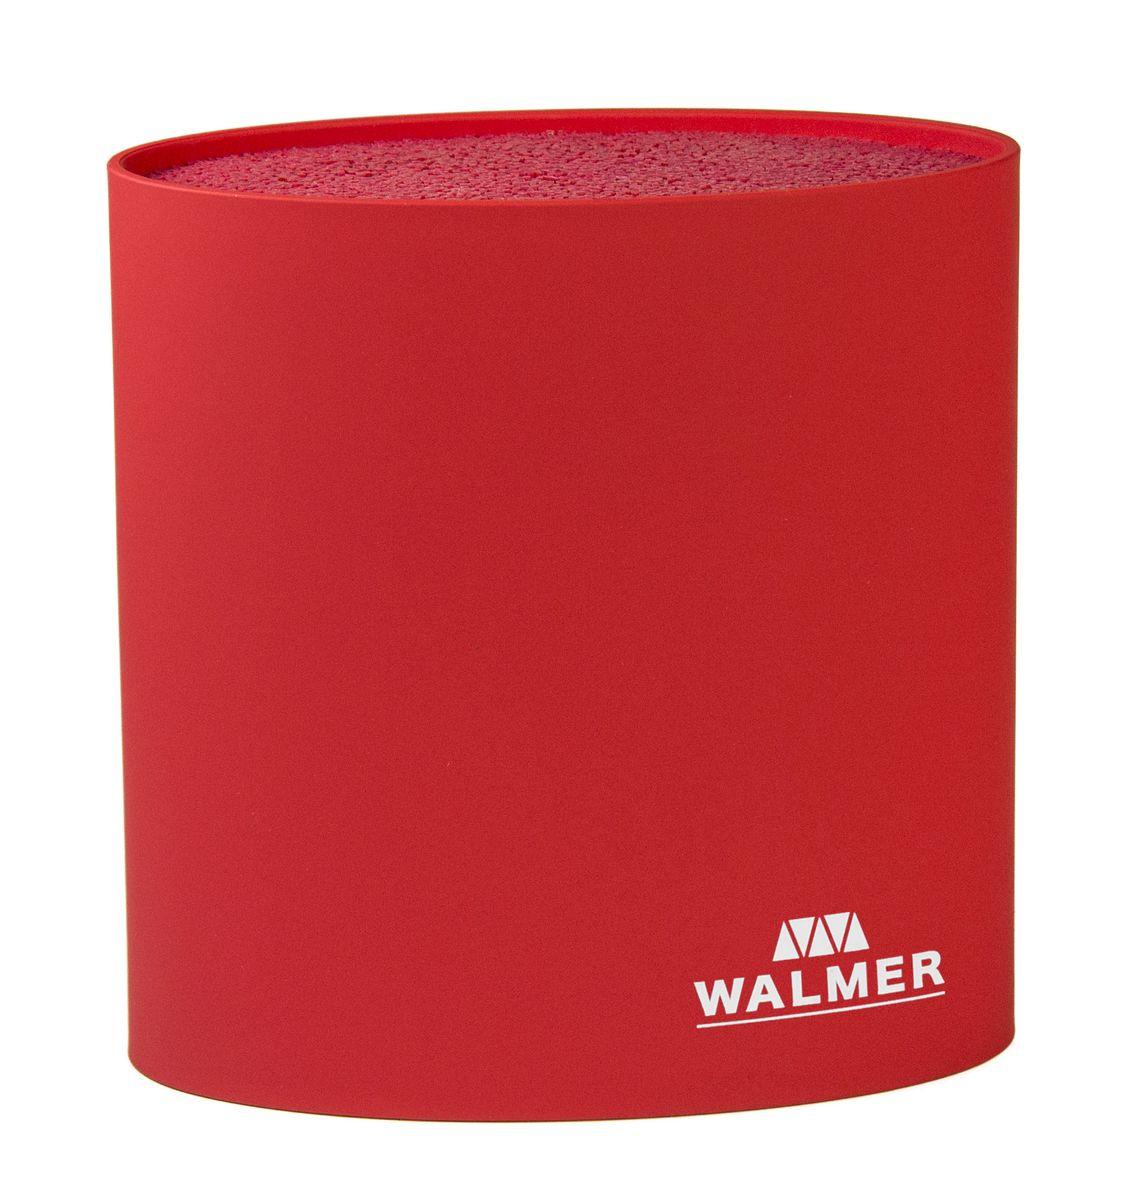 Подставка для ножей овальная, 16x7x16см, красная ТМ WALMERW08002202Подставка для ножей овальная, 16x7x16см, красная ТМ WALMER